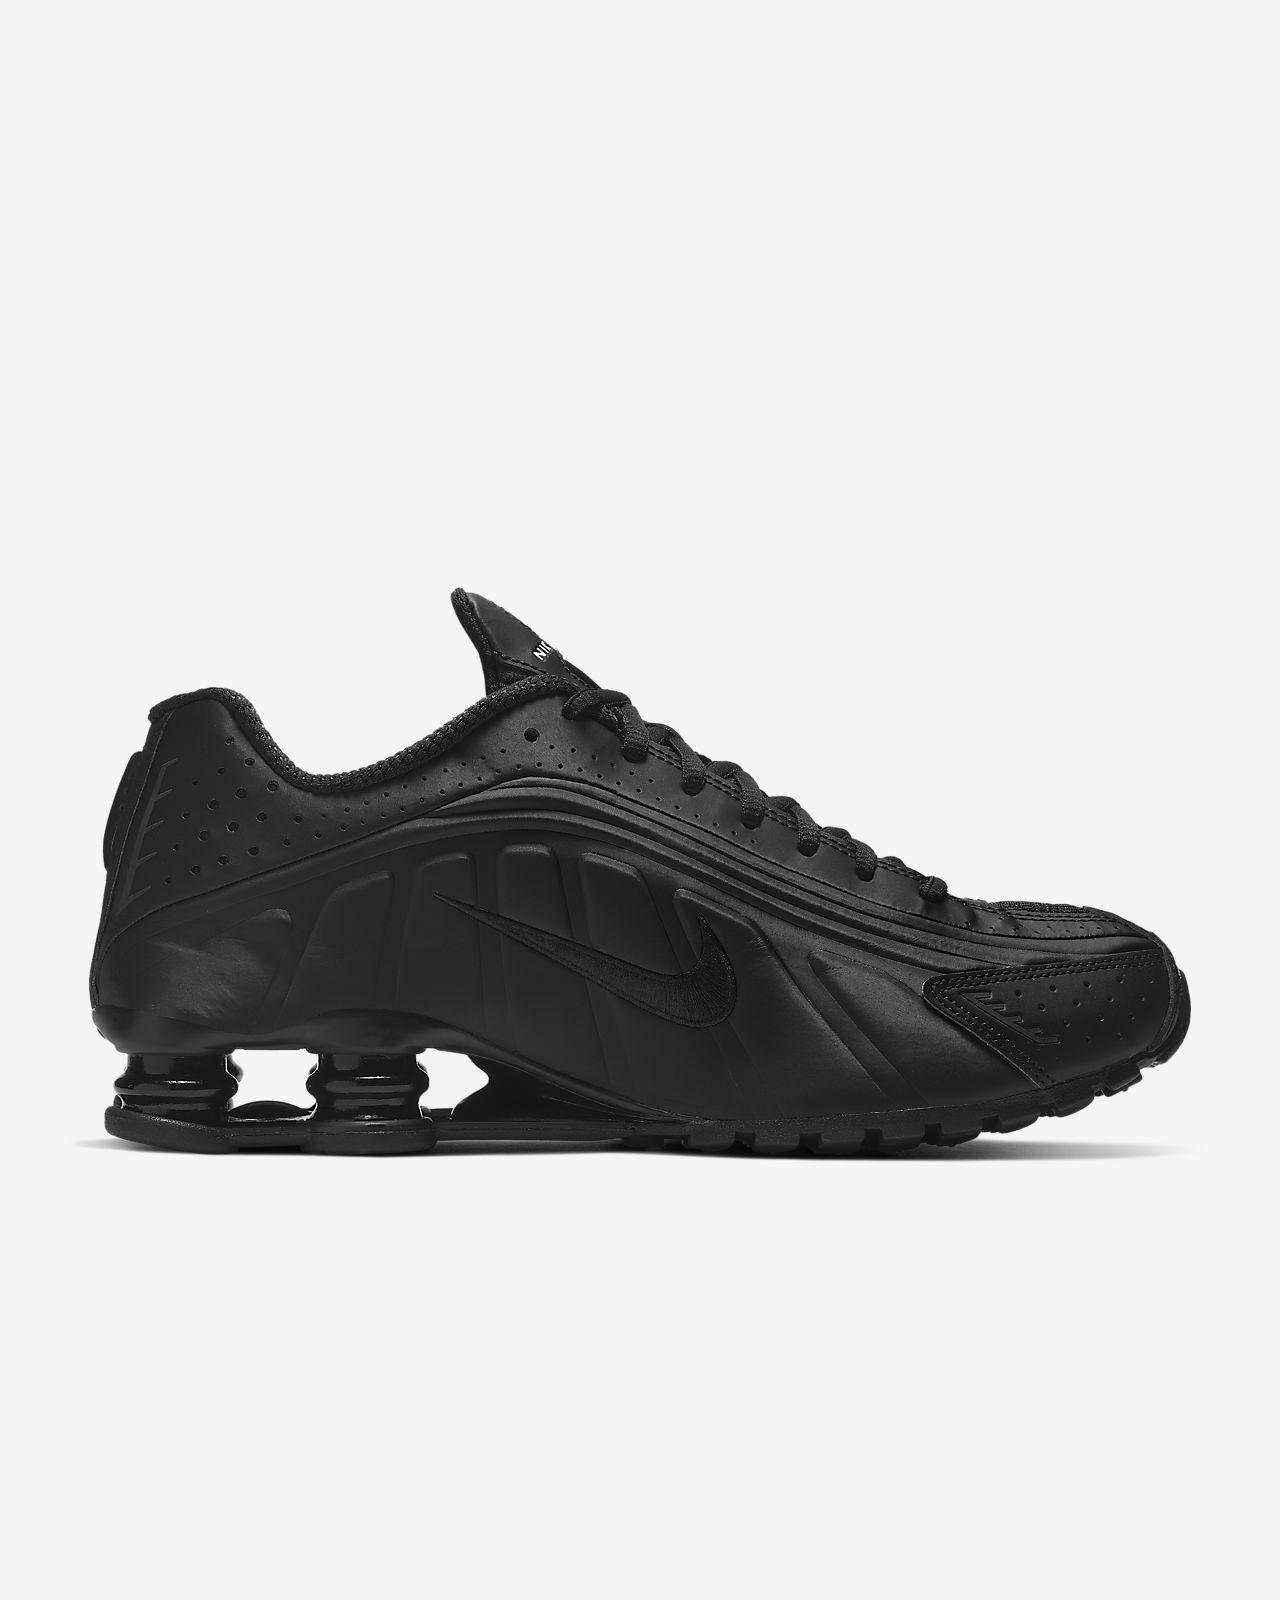 Nike Shox R4 migliori scarpe running | Acquista online su